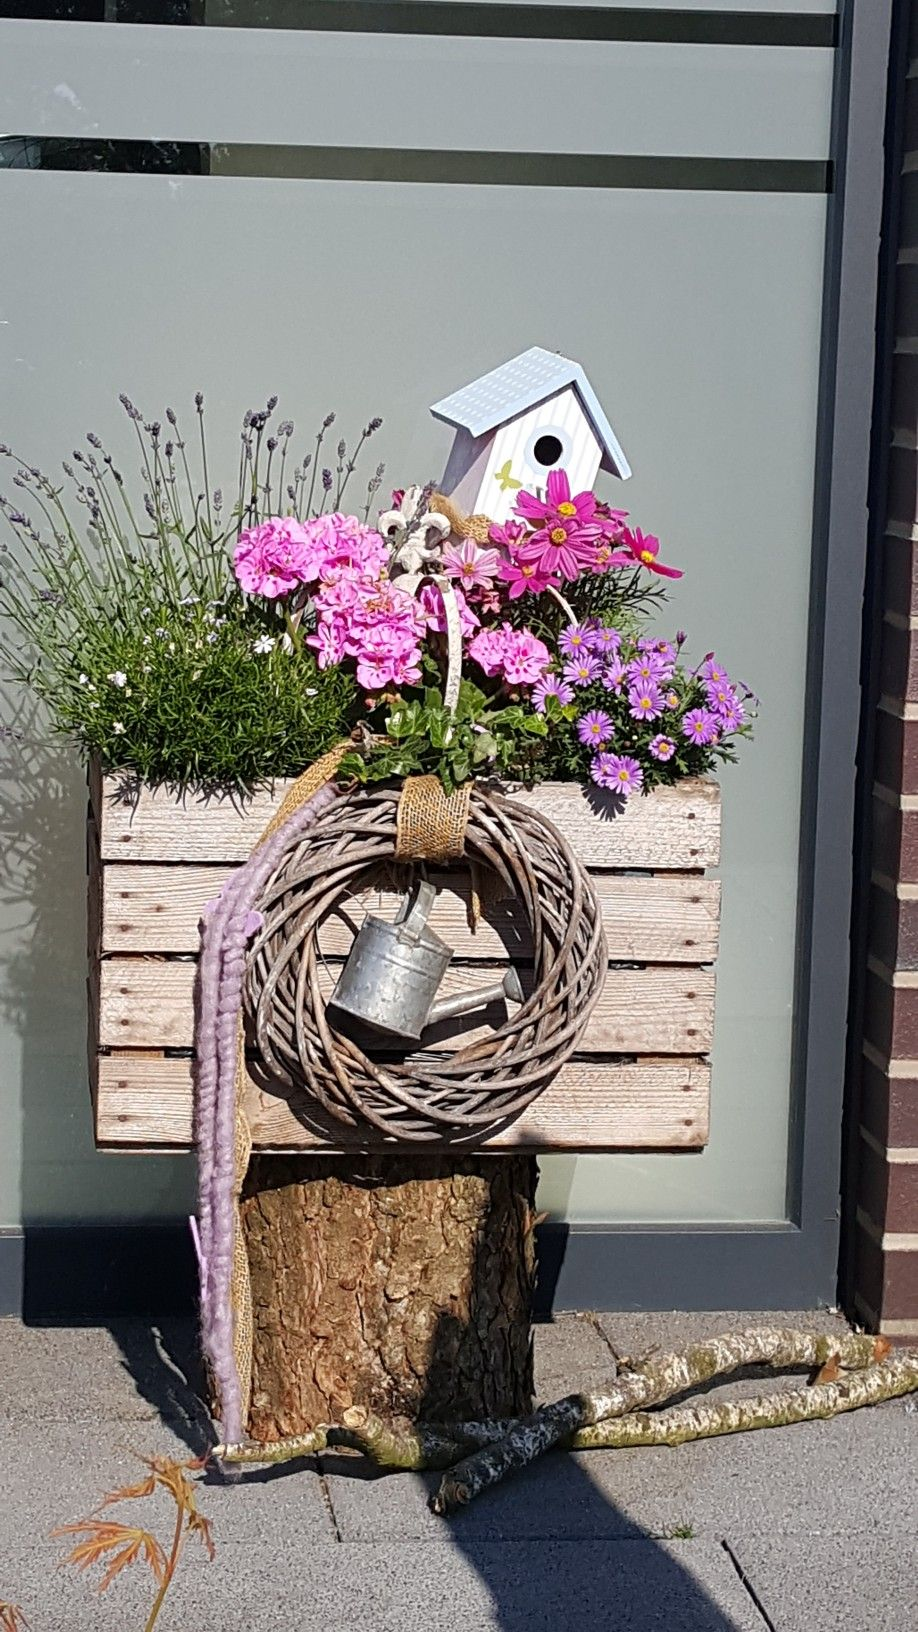 Hauseingang Dekorieren Luxus sommerdeko Blumendeko Haustür Eingang Deko